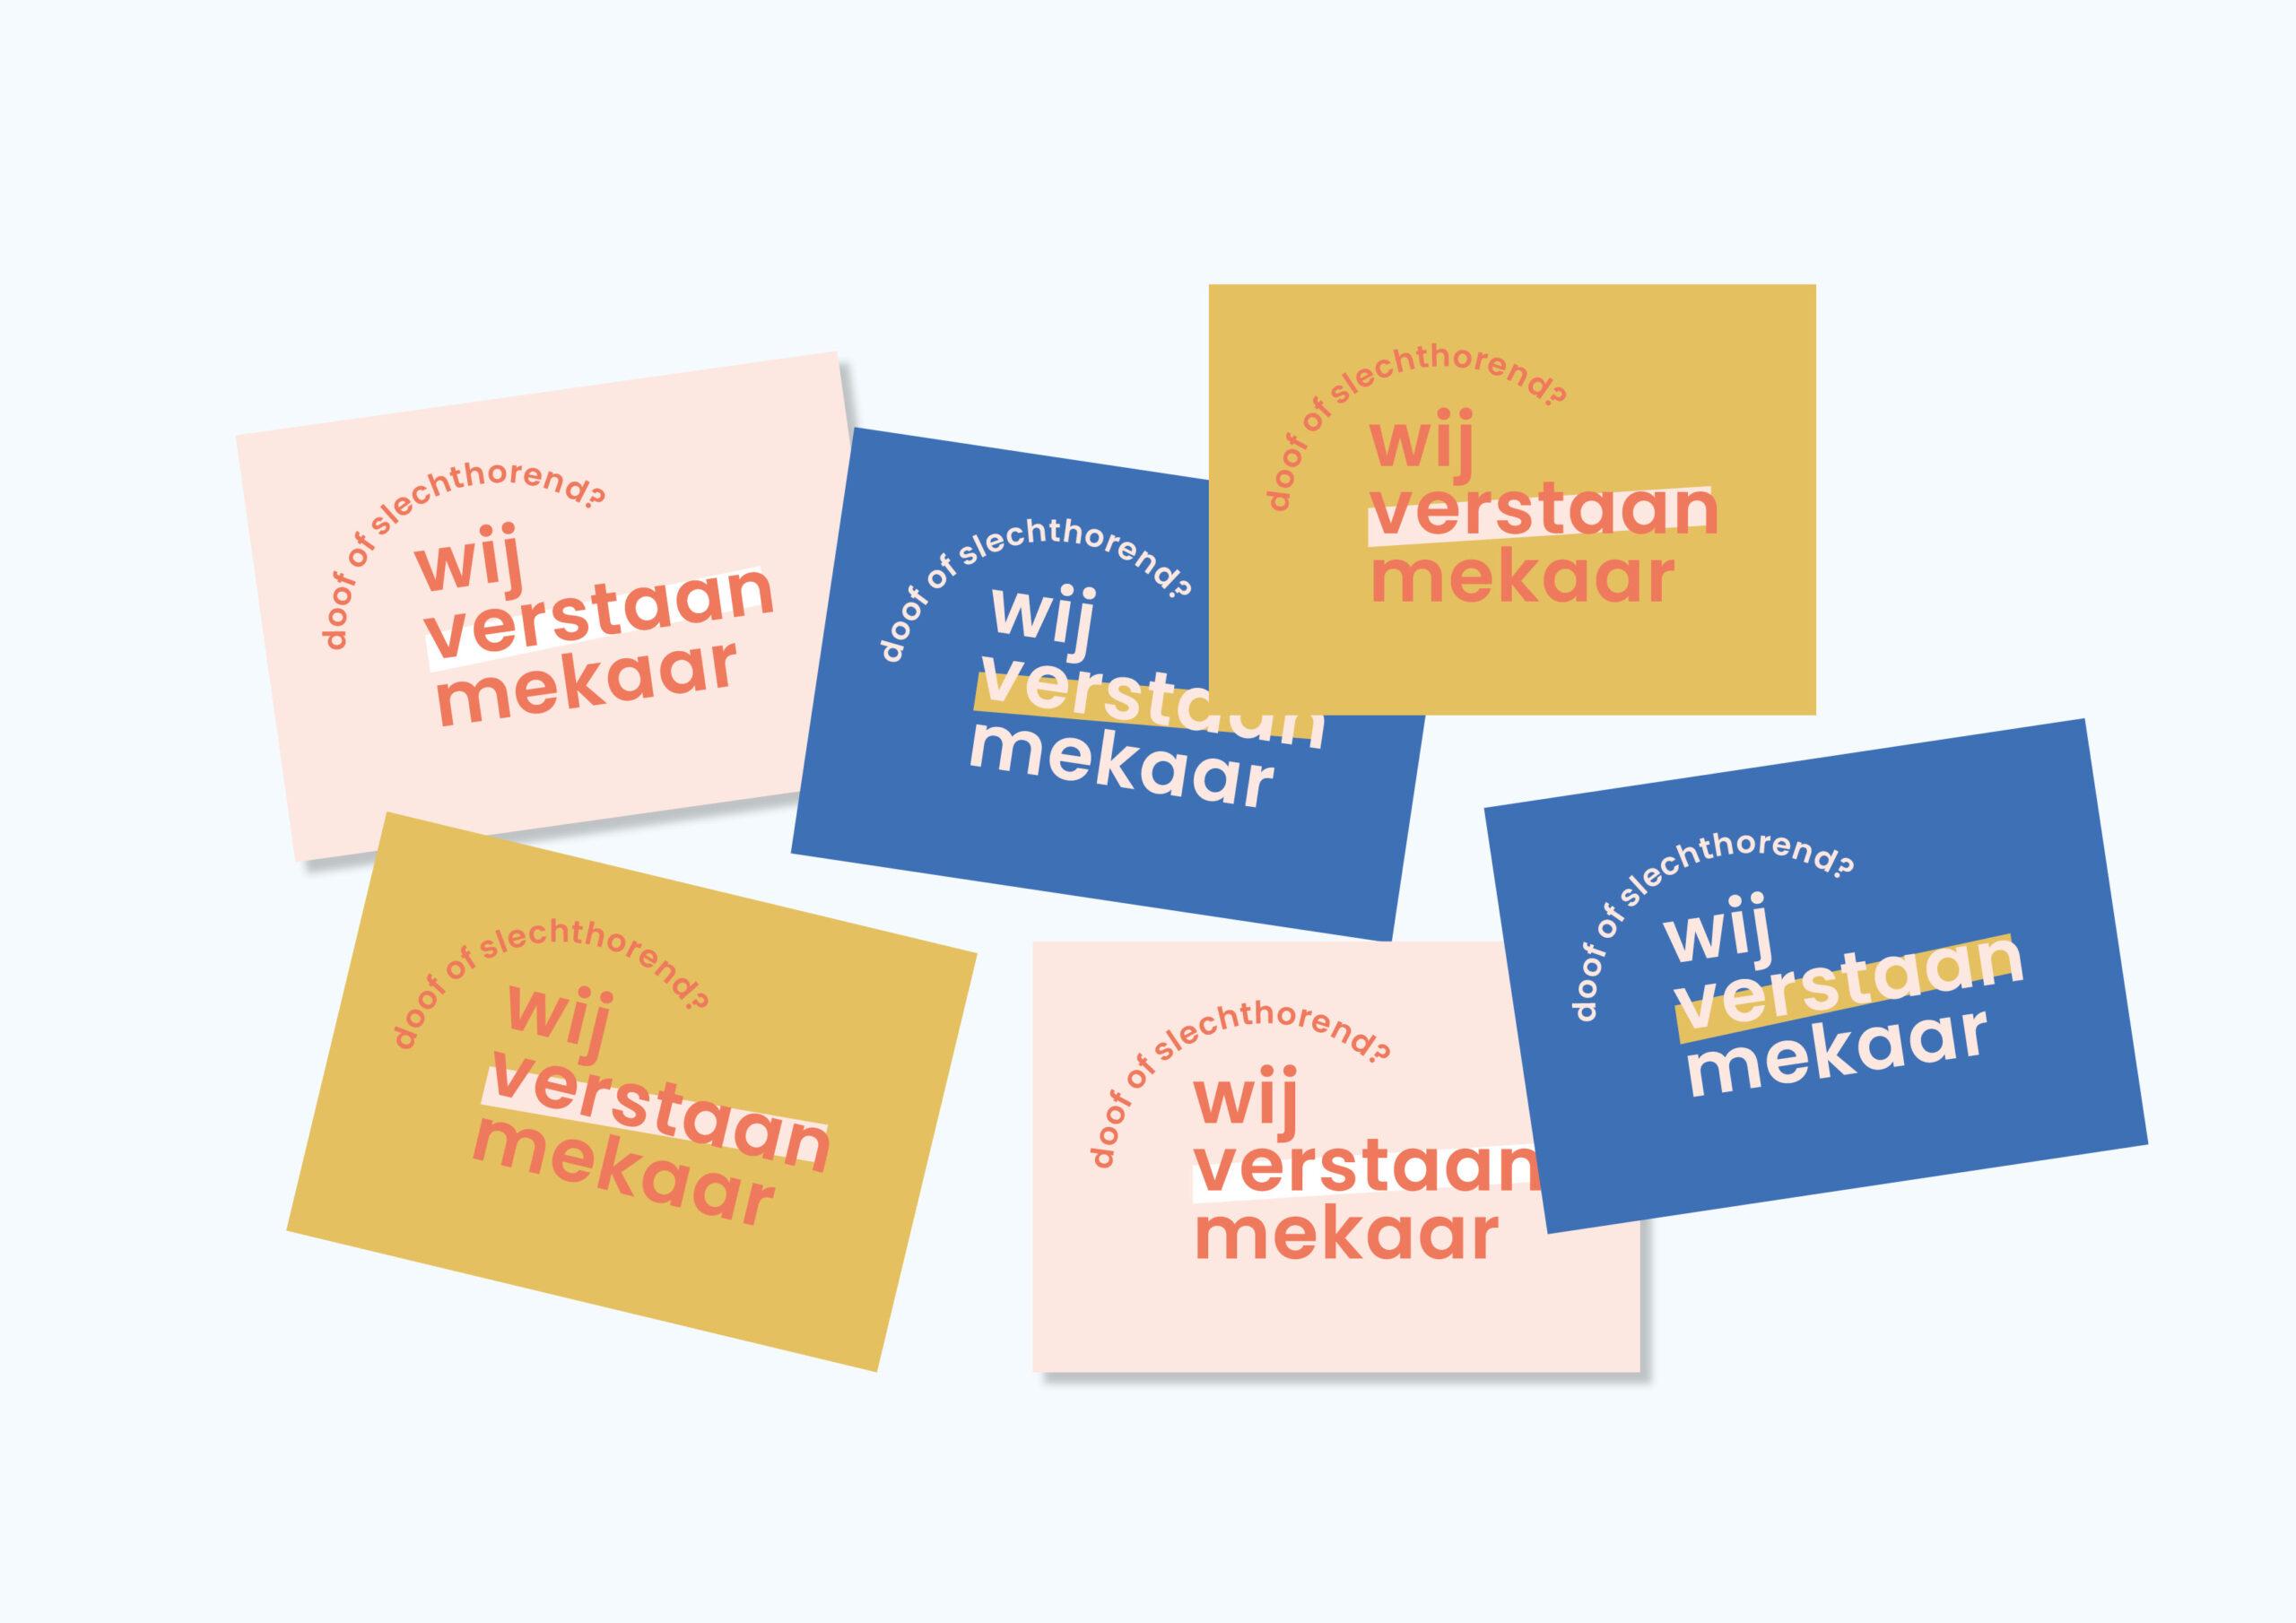 Mount-zirkel-grafisch-bureau-grafische-vormgeving-campagne-poster-campagnebeeld-slechthorende-button-buttons-postkaart